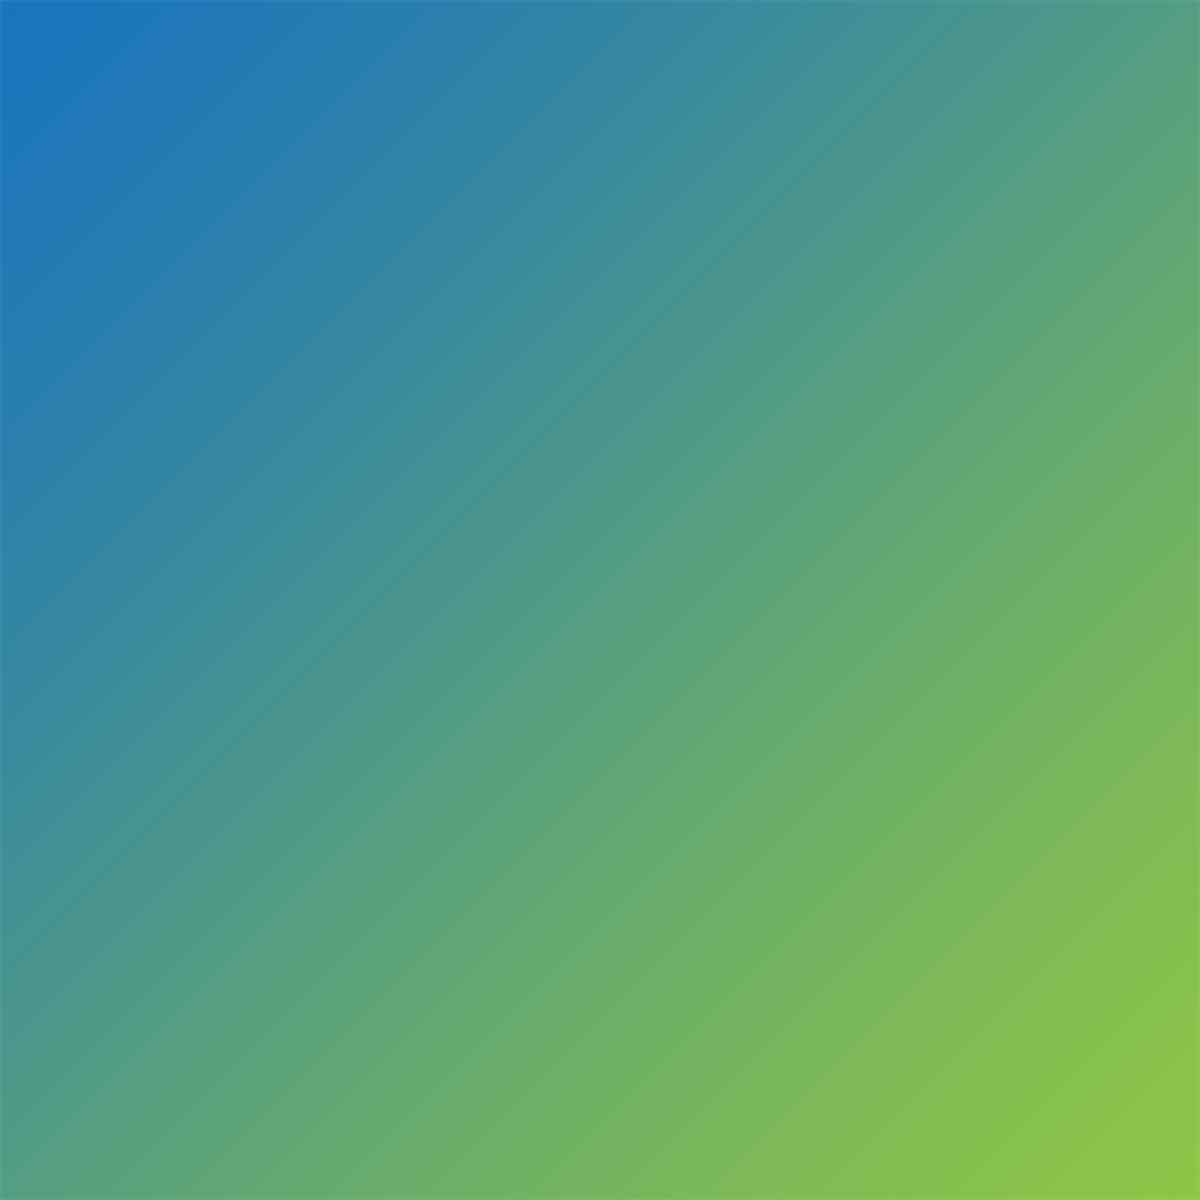 https://akilpohuaraz.com/wp-content/uploads/2018/09/bgn-image-box-gradient.jpg